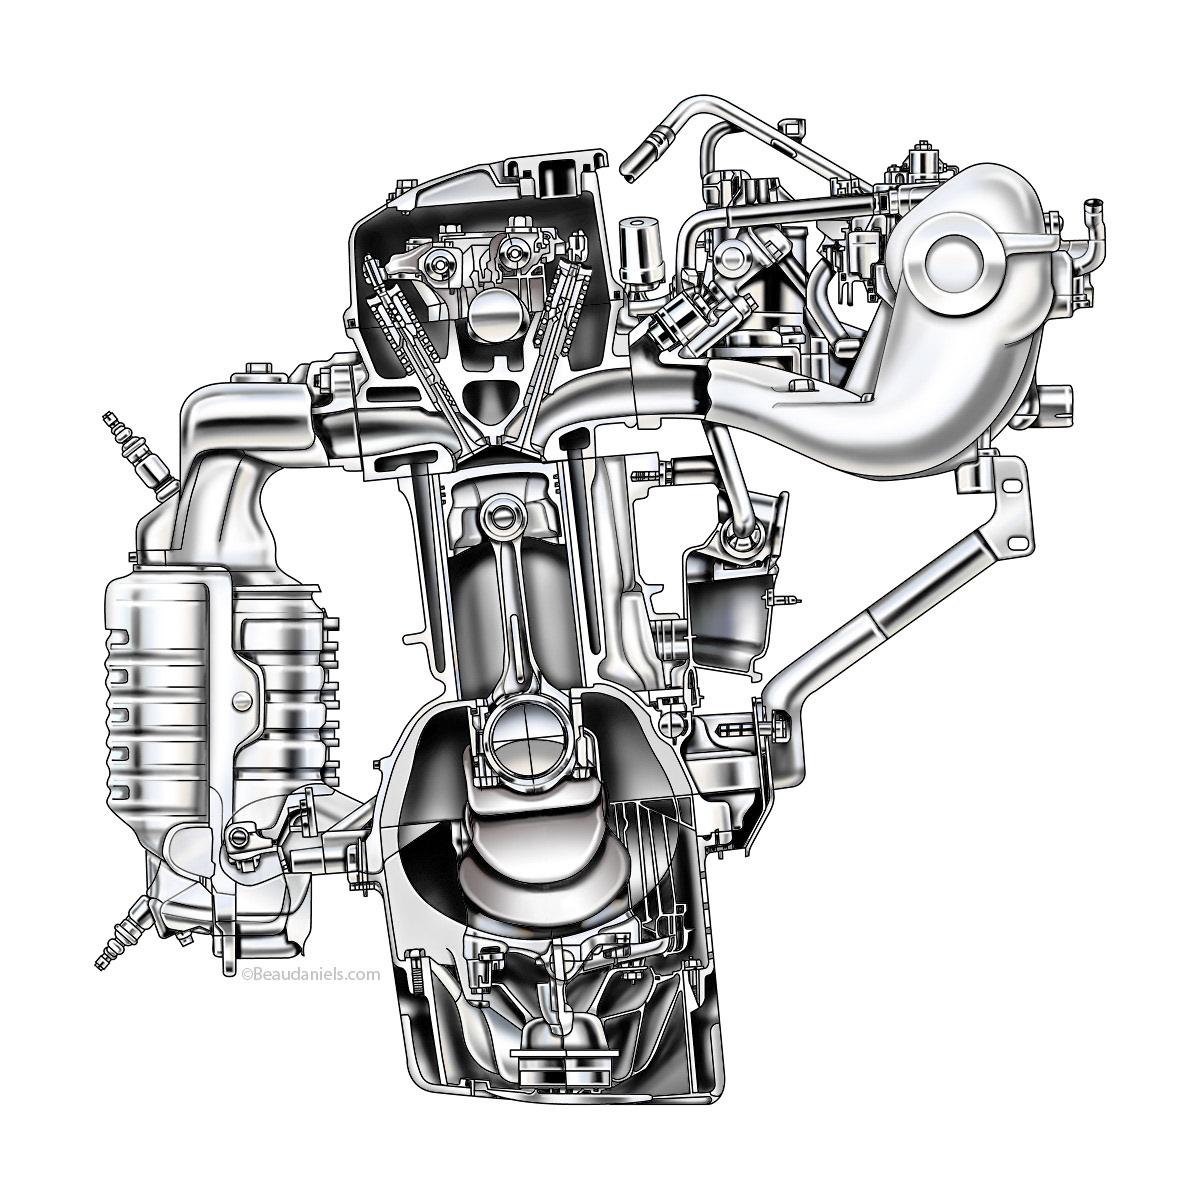 Technical illustration beau and alan daniels honda ulev vtec cross section honda gas engine malvernweather Gallery